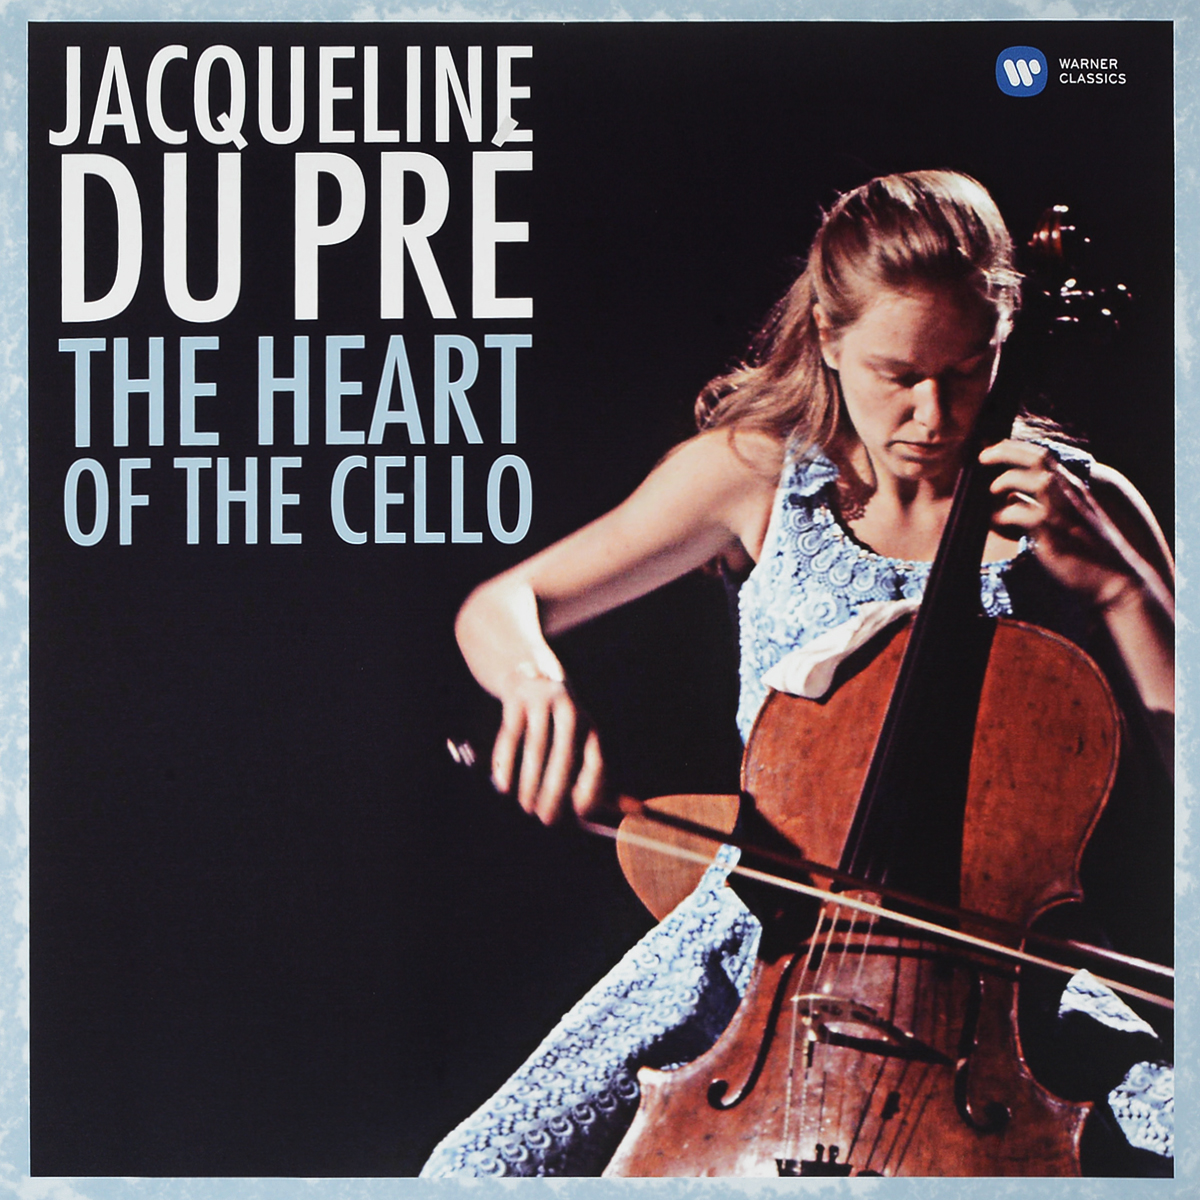 Жаклин Дю Пре Jacqueline Du Pre. The Heart Of The Cello (LP) жаклин дю пре jacqueline du pre dvorak cello concerto in b minor op 104 lp